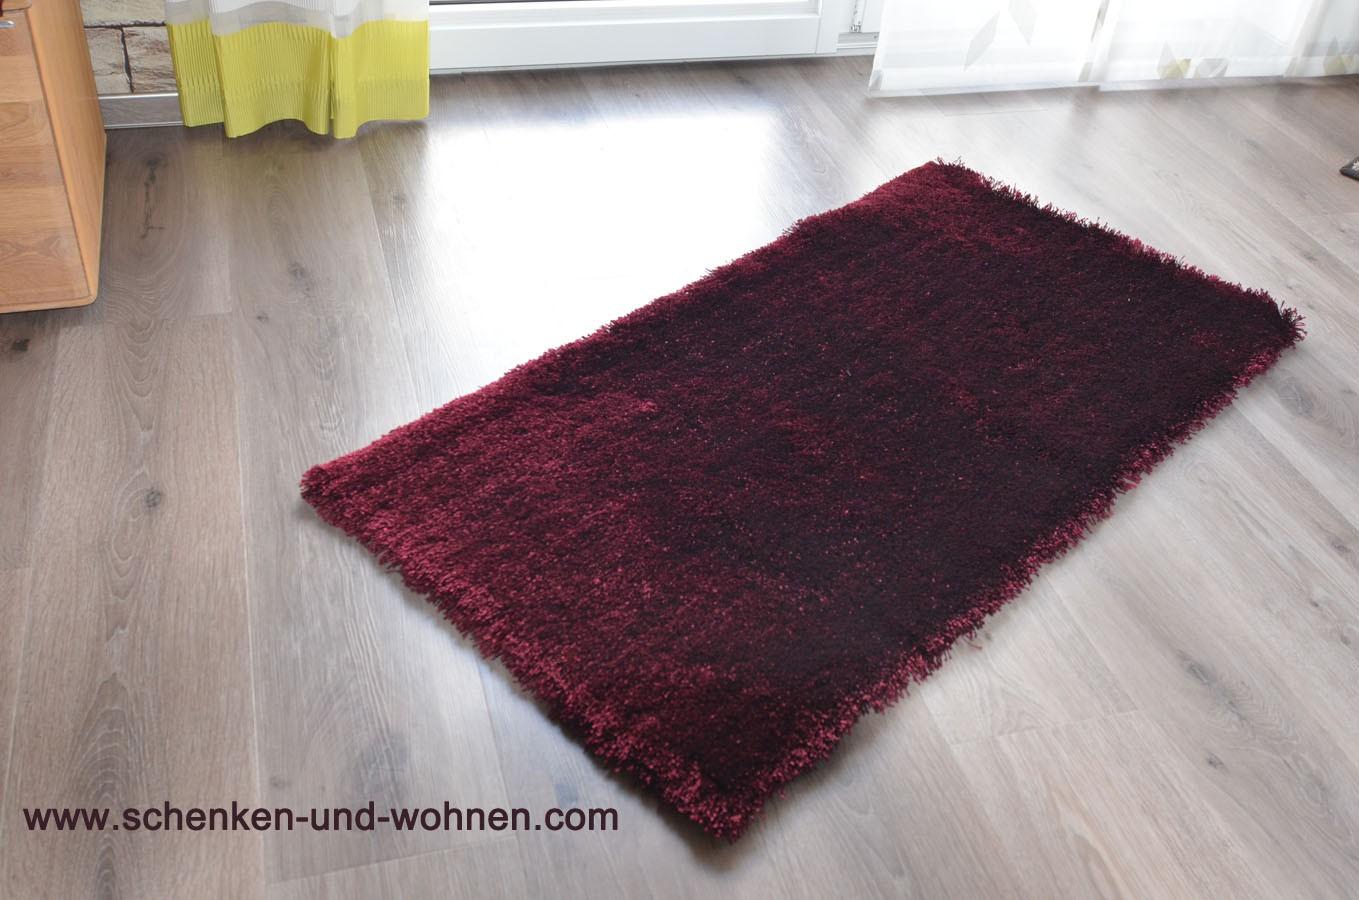 JOOP - Teppich Curly purple, getuftet 70 x 140 cm